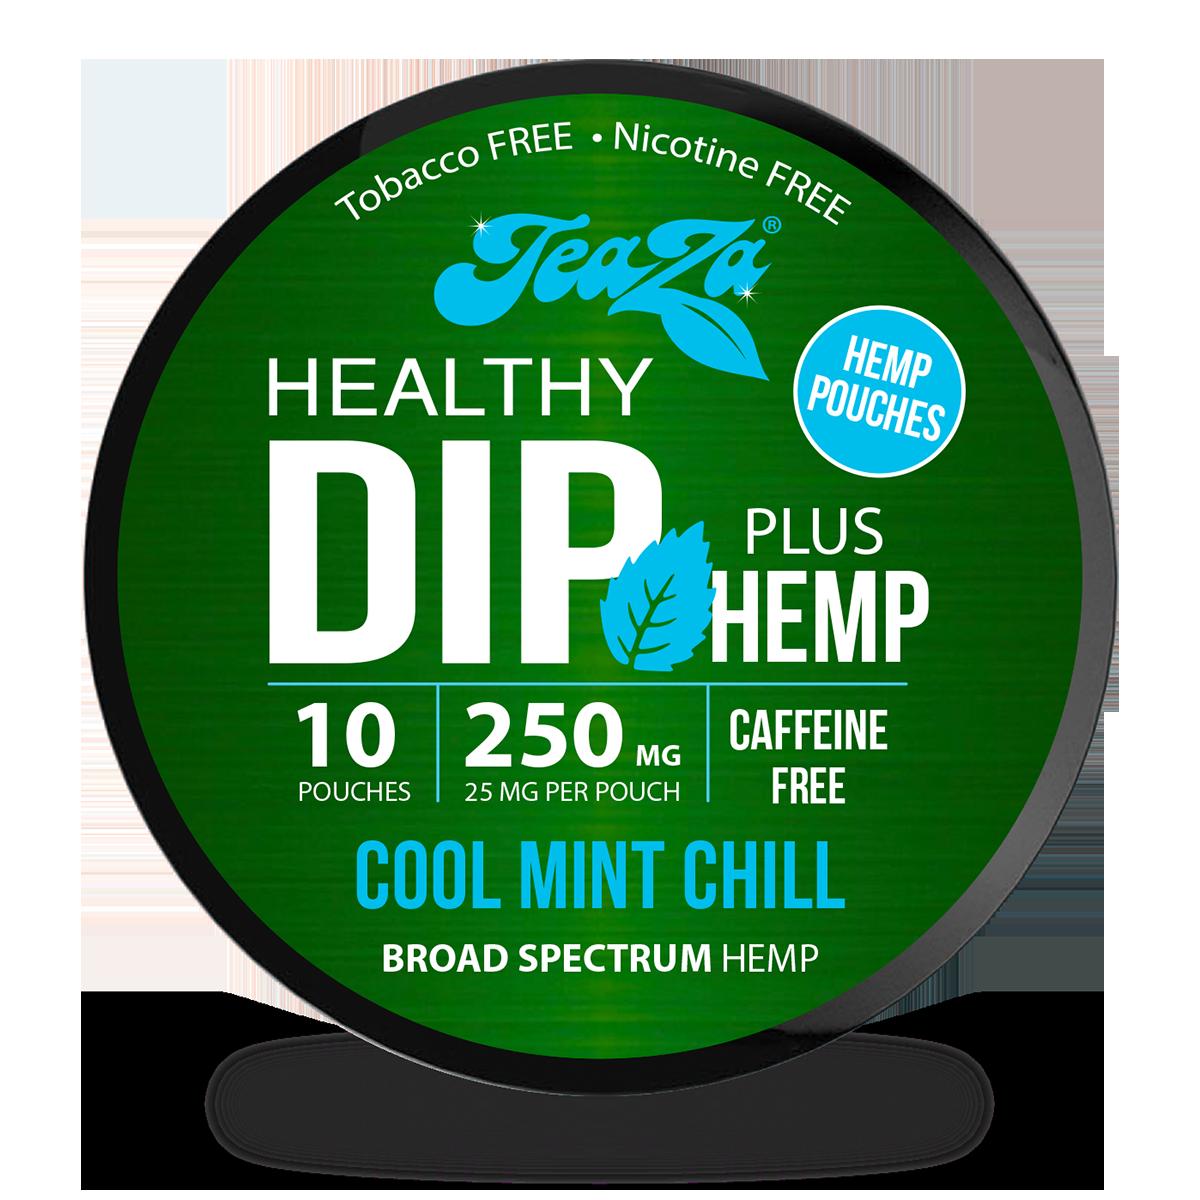 Cool Mint Chill Hemp Dip Pouches